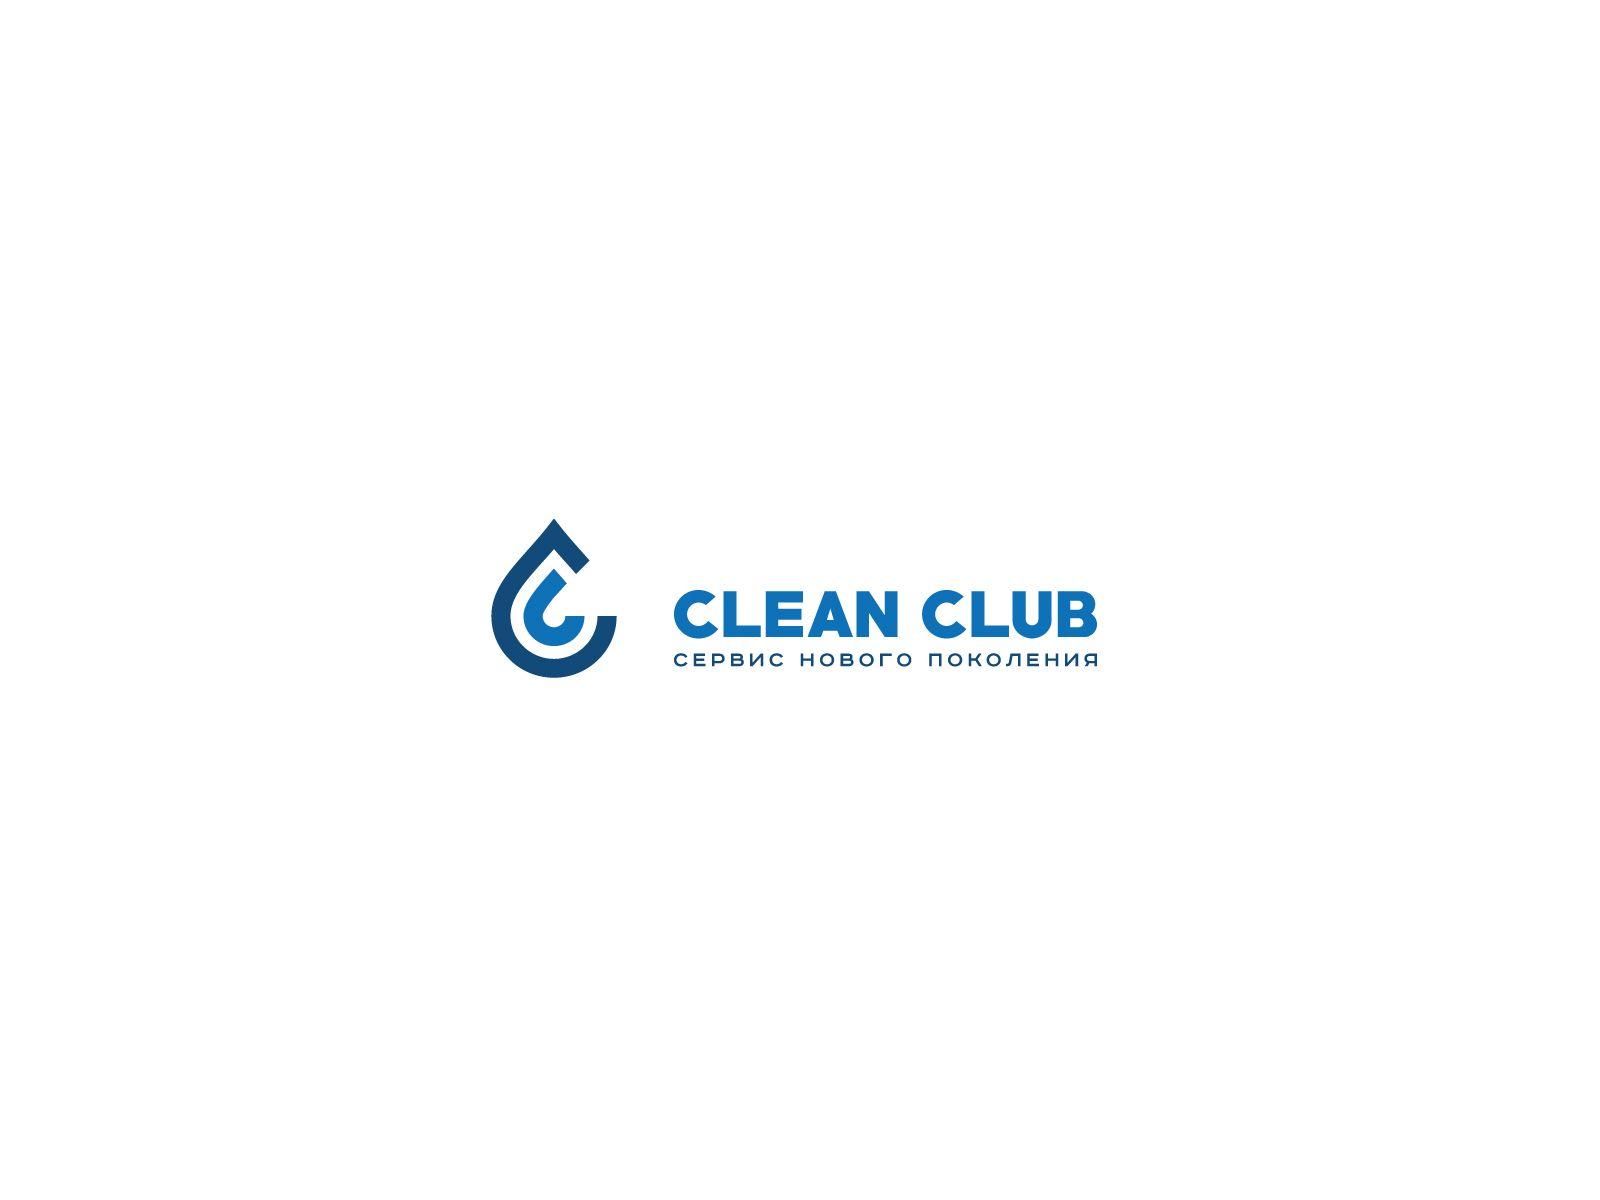 Логотип для CleanClub - дизайнер U4po4mak